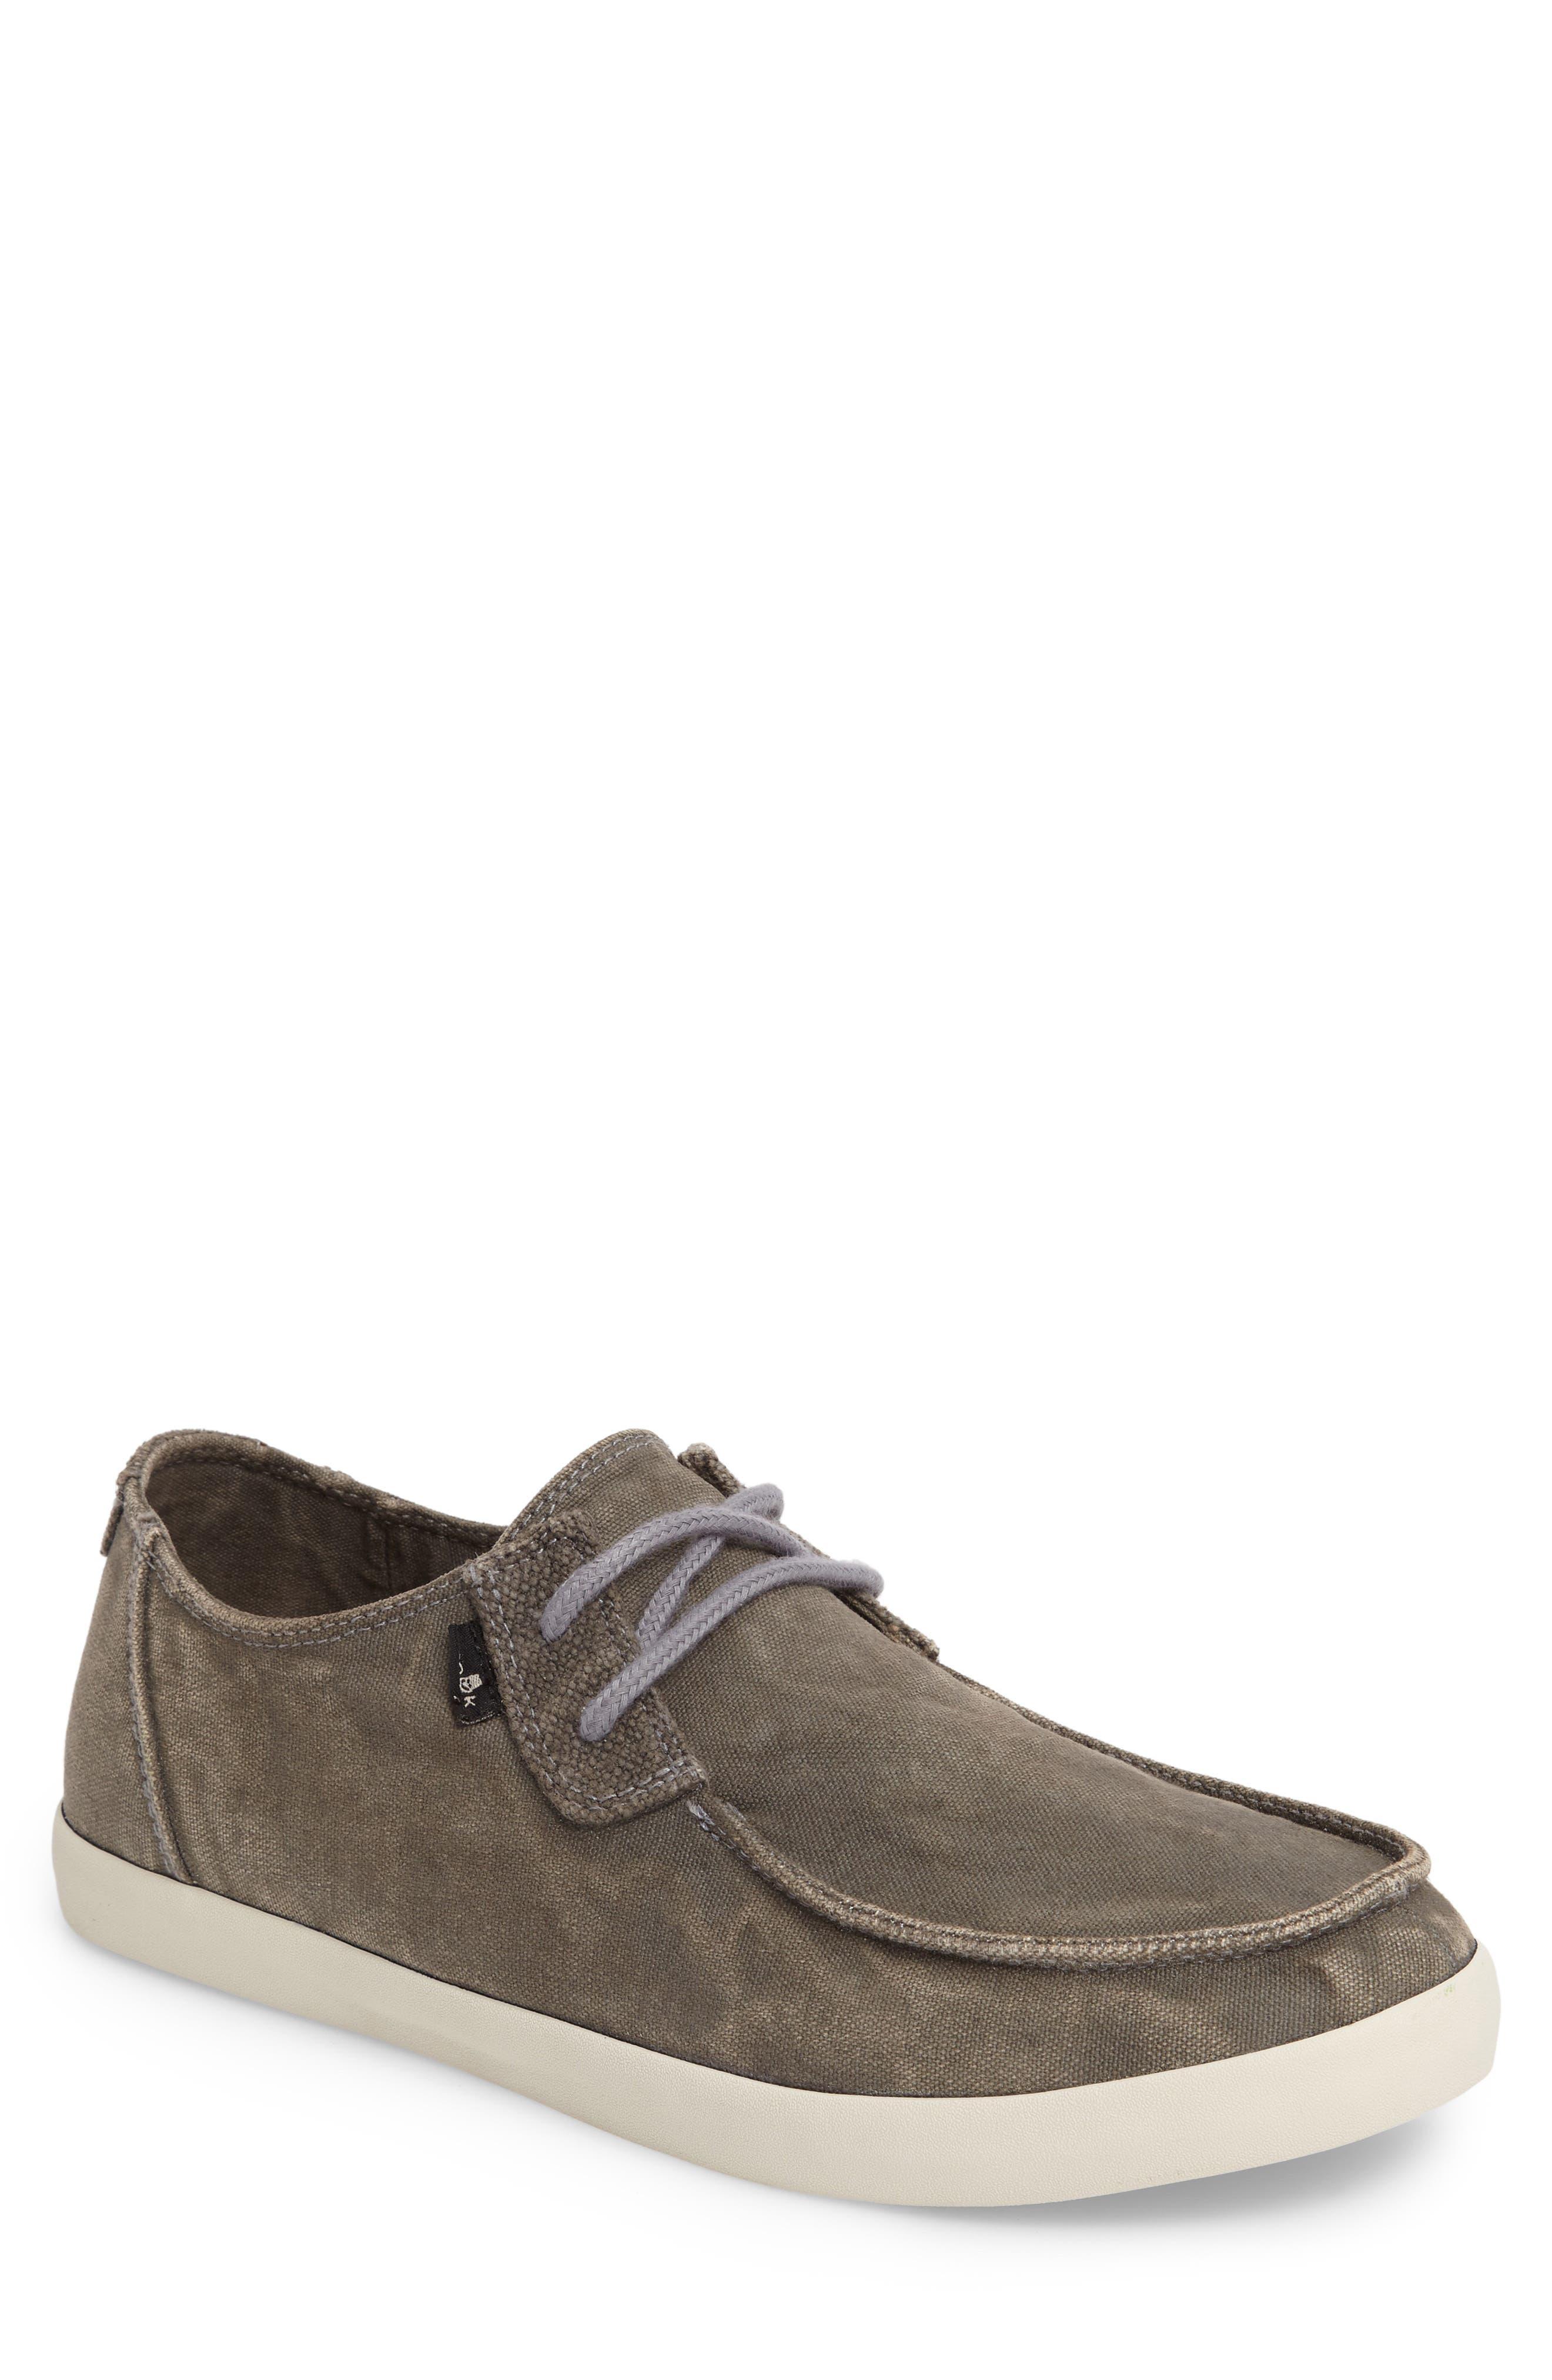 Numami Sneaker,                             Main thumbnail 1, color,                             051